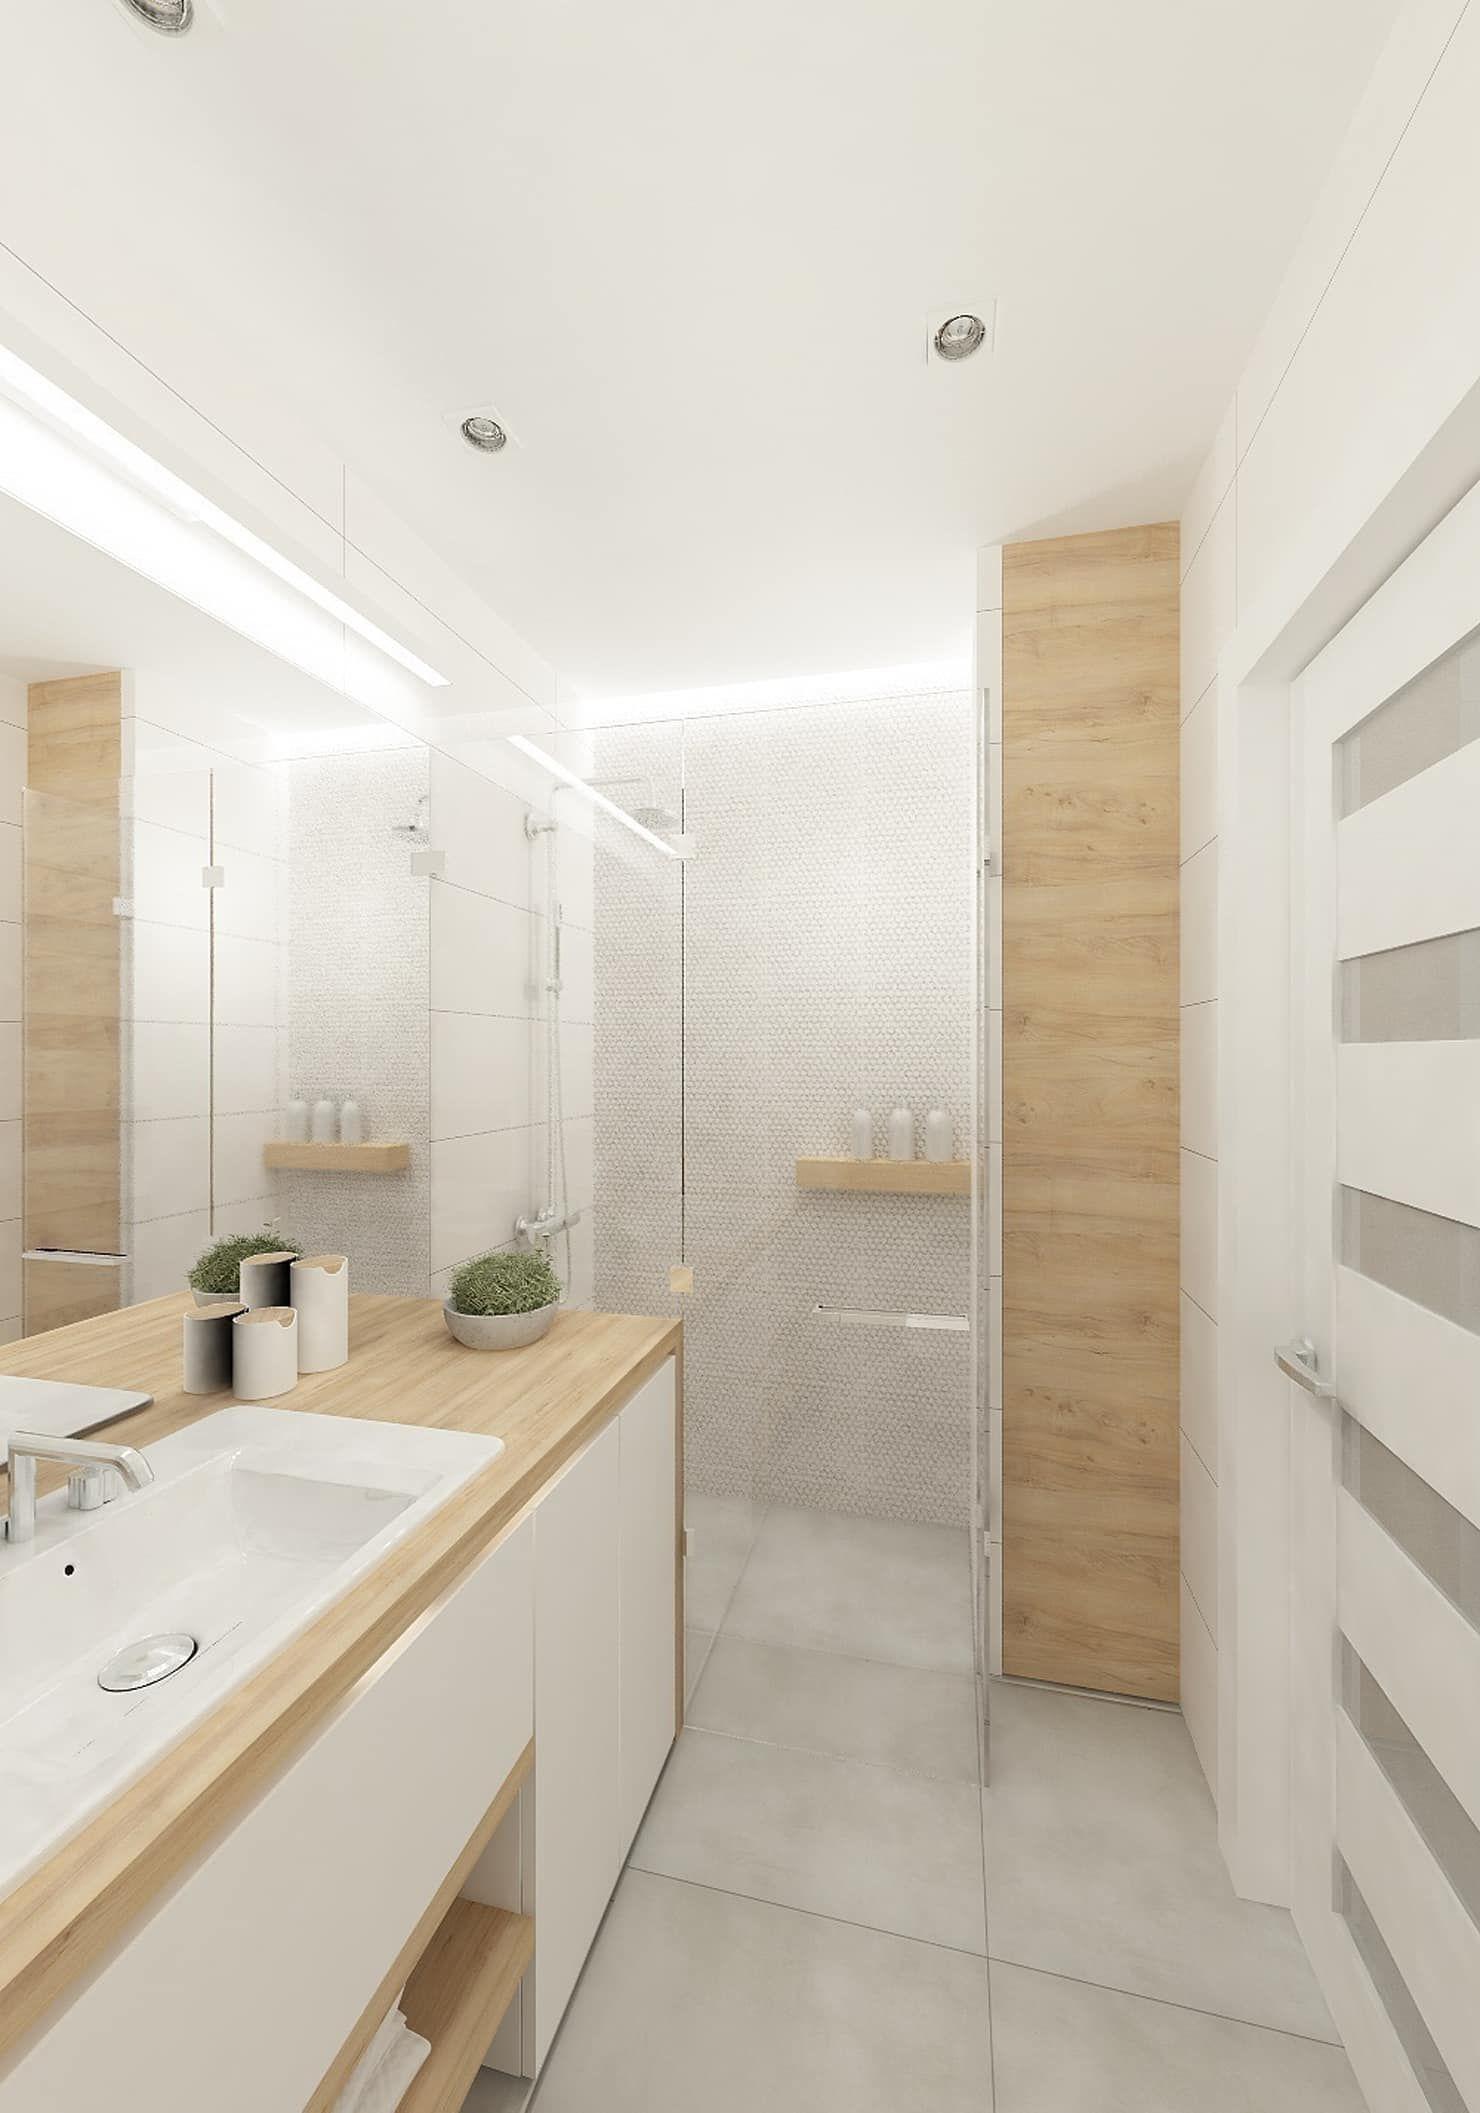 Skandinavische Badezimmer Von 4ma Projekt Skandinavisch In 2020